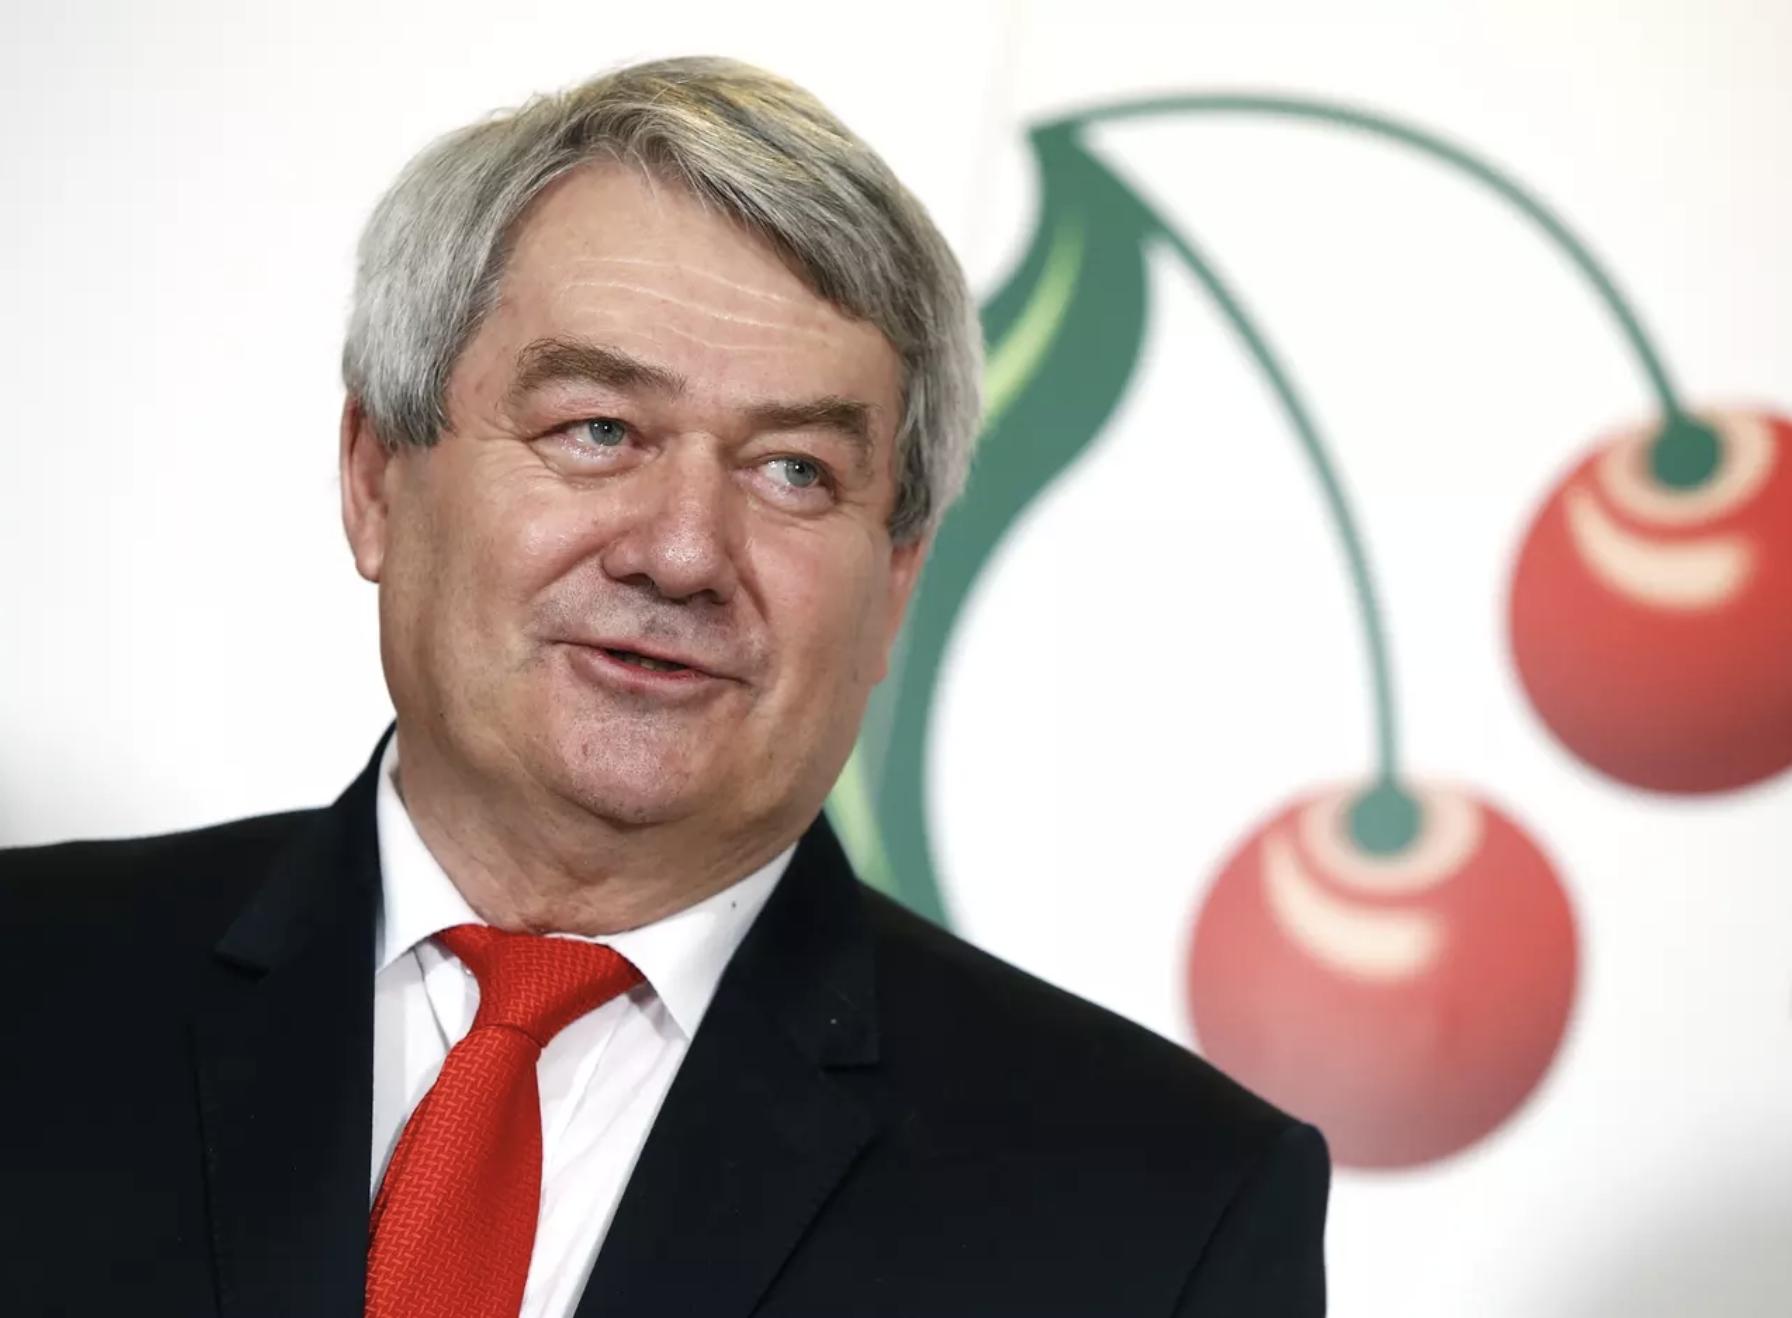 Vojtěch Filip a Cseh Kommunista Párt (KSČM) elnöke, Fotó: Petr Hloušek, Právo